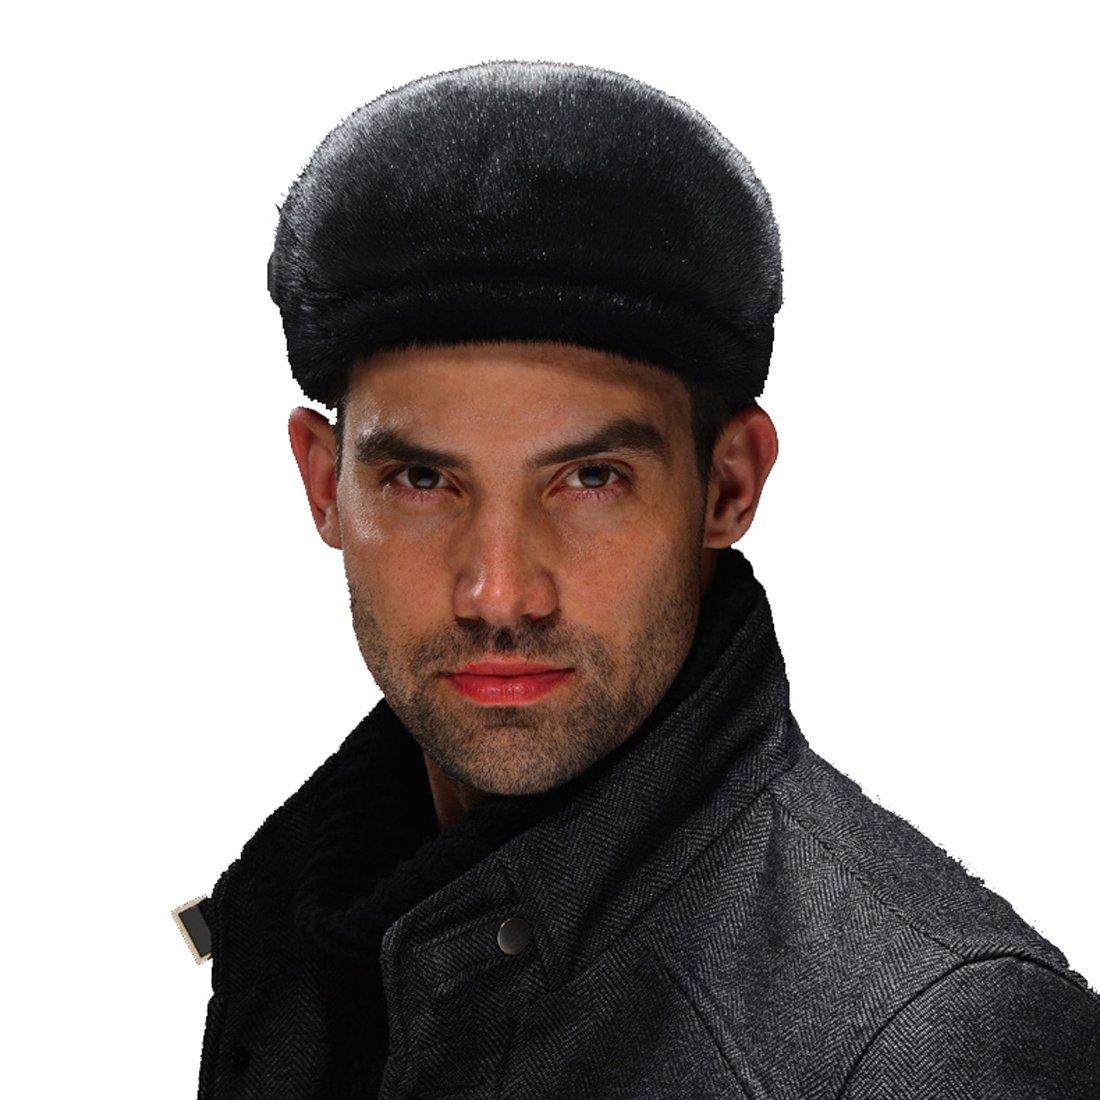 URSFUR Men's Sealskin Full Fur Cabbie Cap (Black)